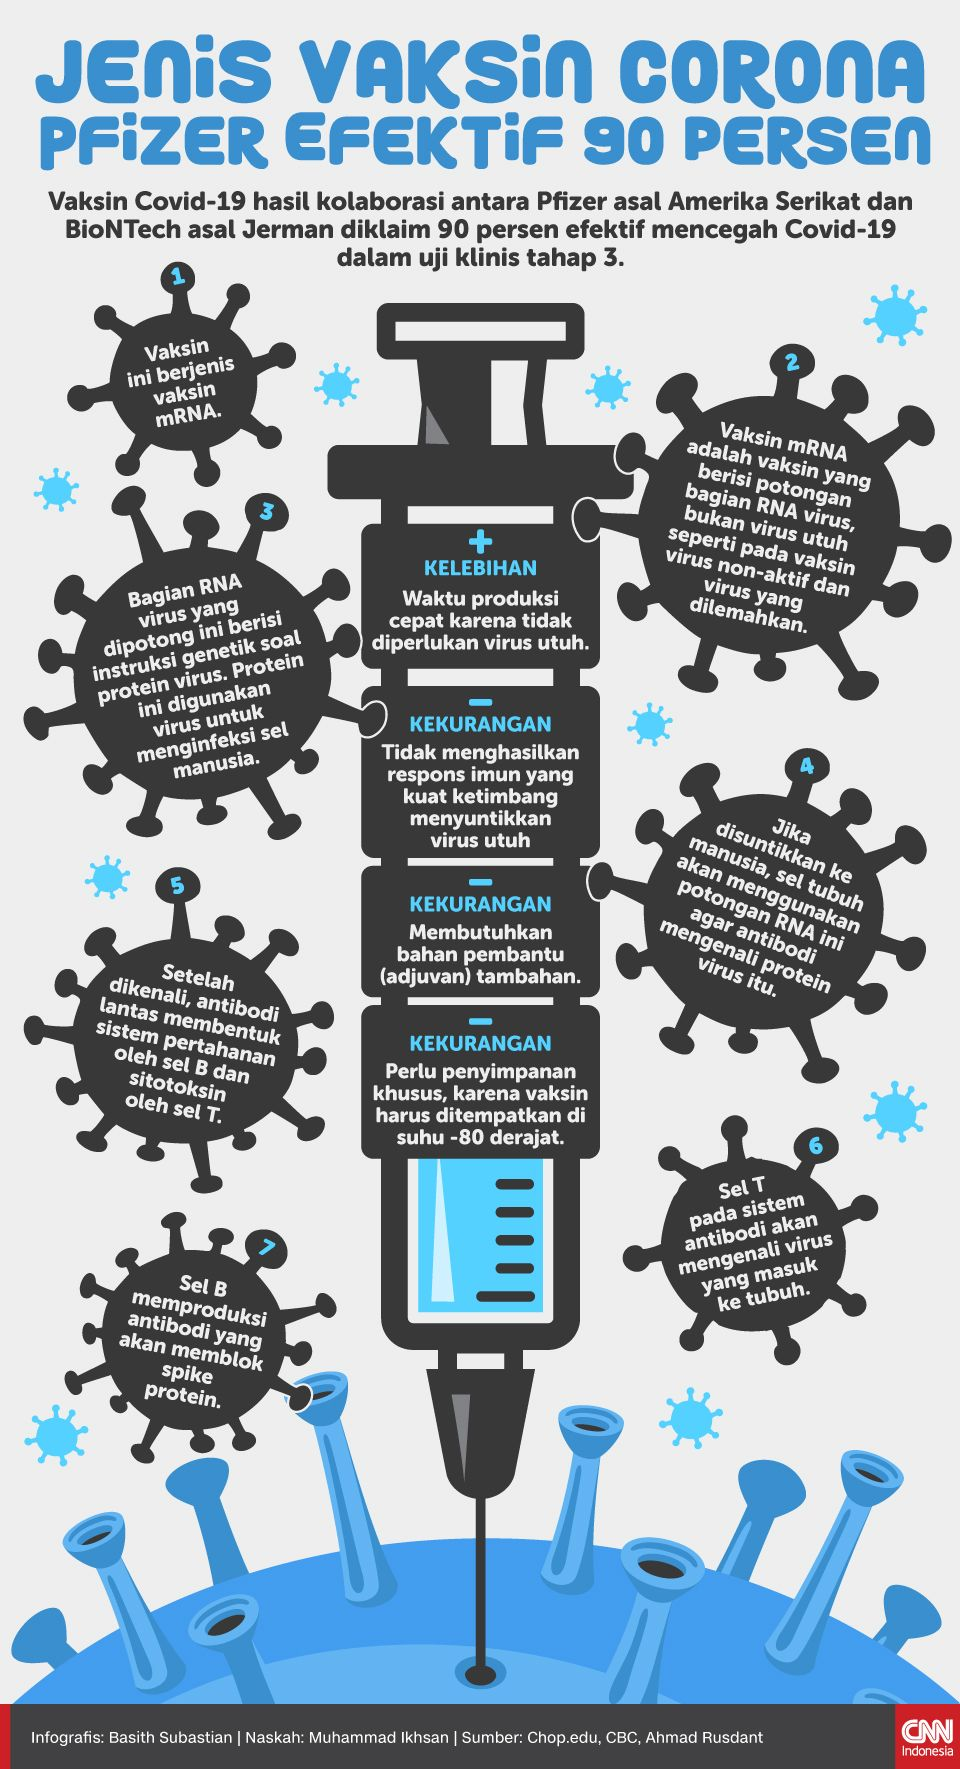 Infografis Jenis Vaksin Corona Pfizer Efektif 90 Persen